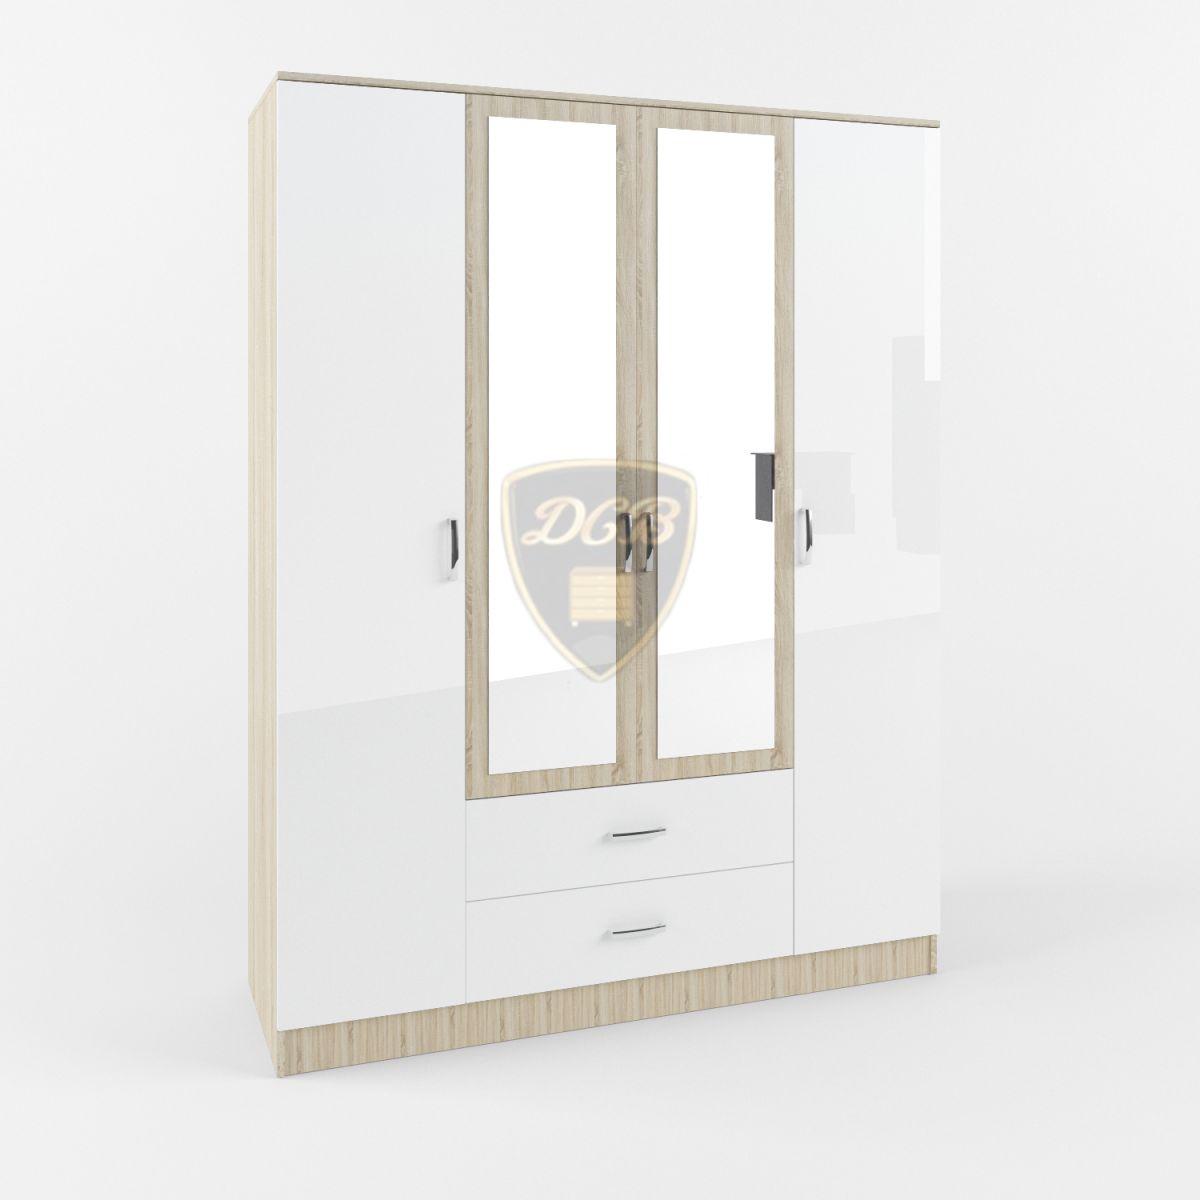 Шкаф четырехстворчатый Софи СШК 1600.1